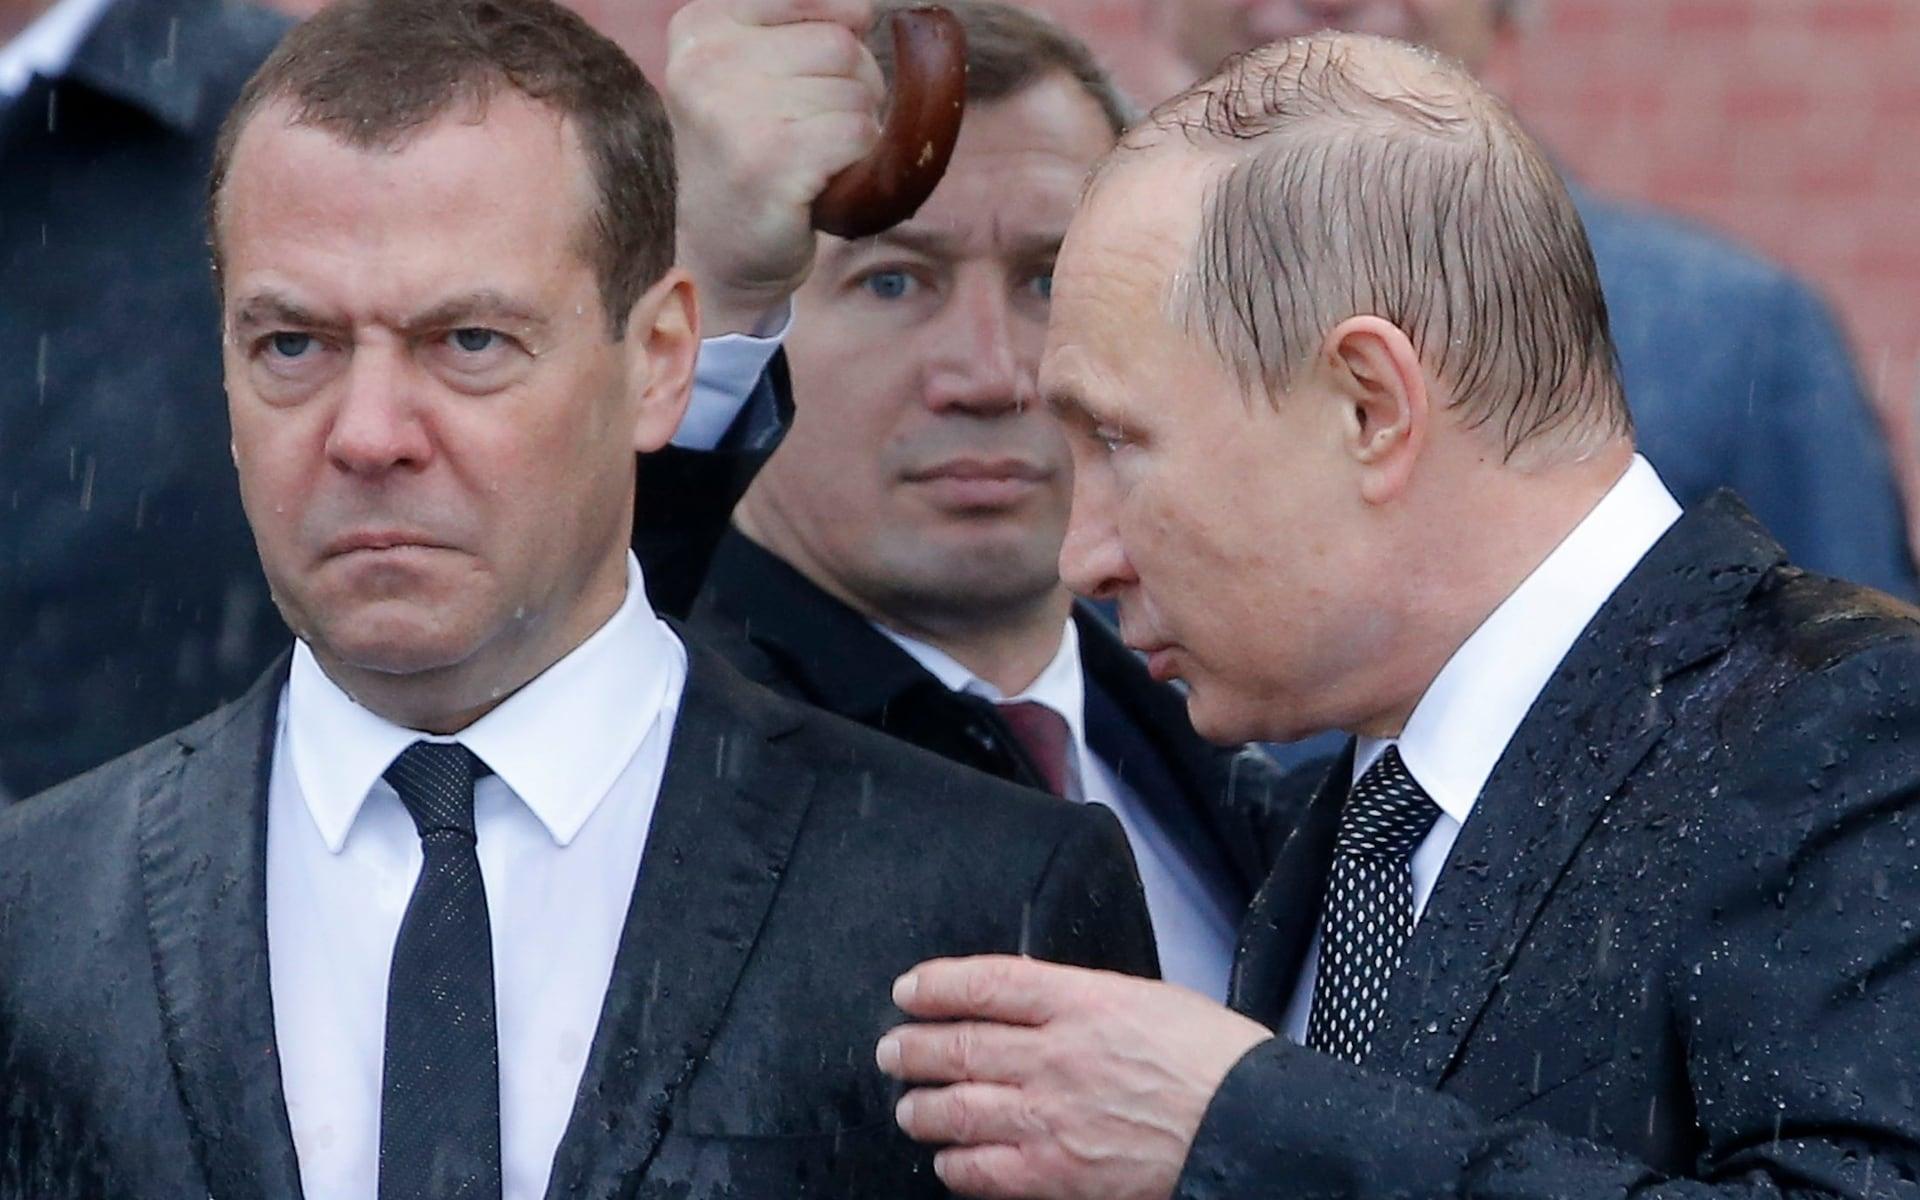 Photo by Sergei Karpukhin/Reuters